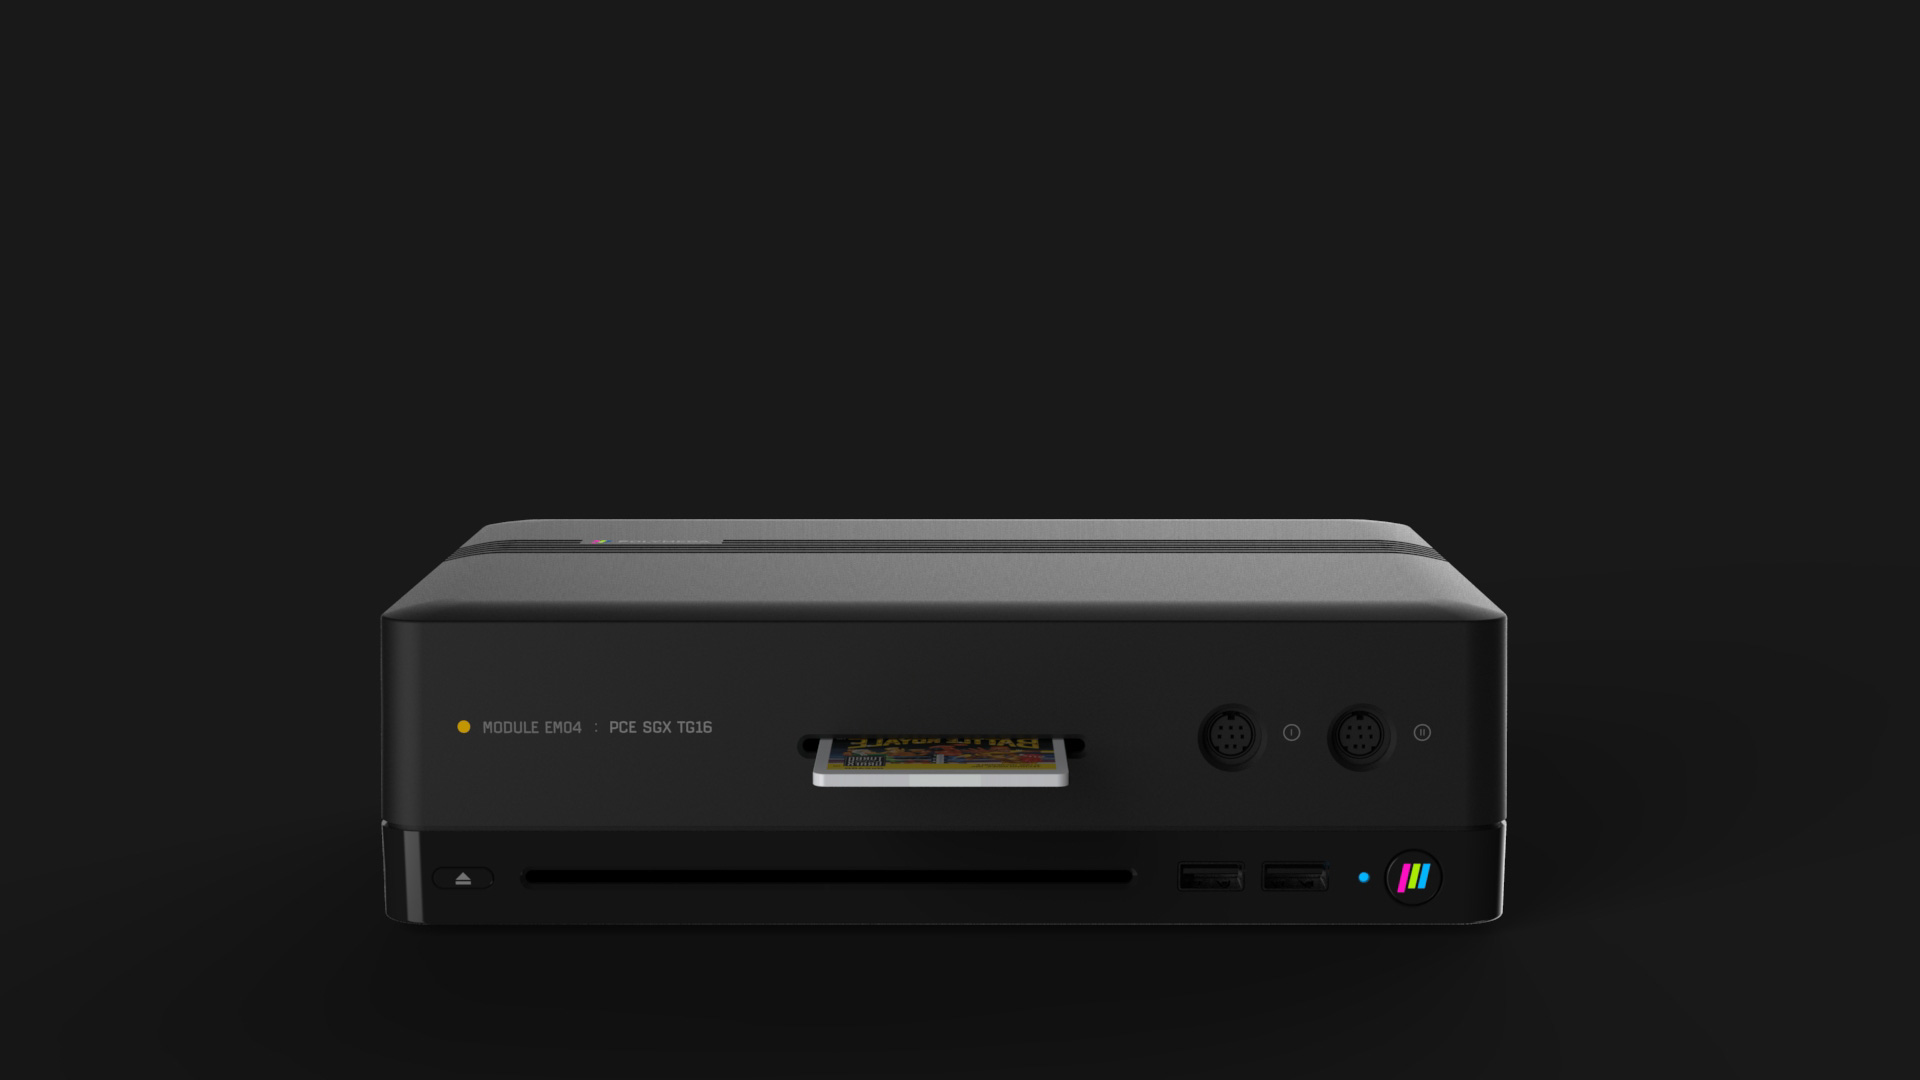 polymega turbo 2 - Nowa konsola Polymega ze wsparciem m.in. dla PlayStation oraz Sega Saturn